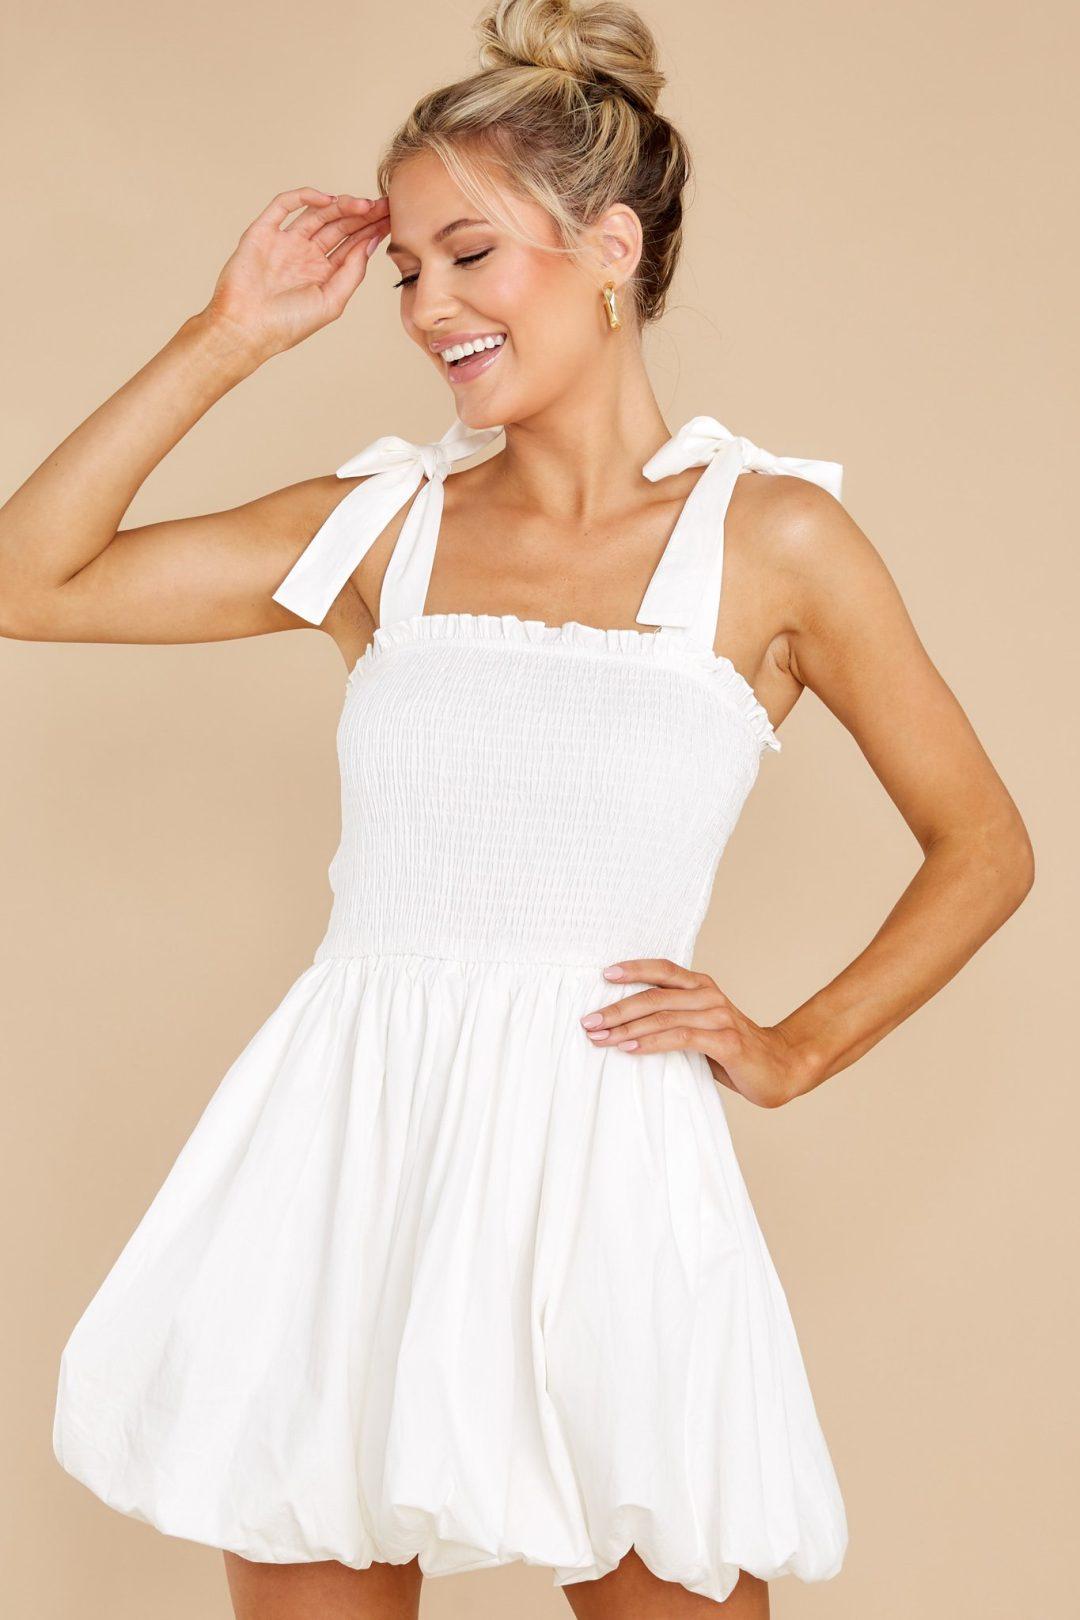 40+ White Summer Dresses That Will Leave You Feeling Like A Goddess